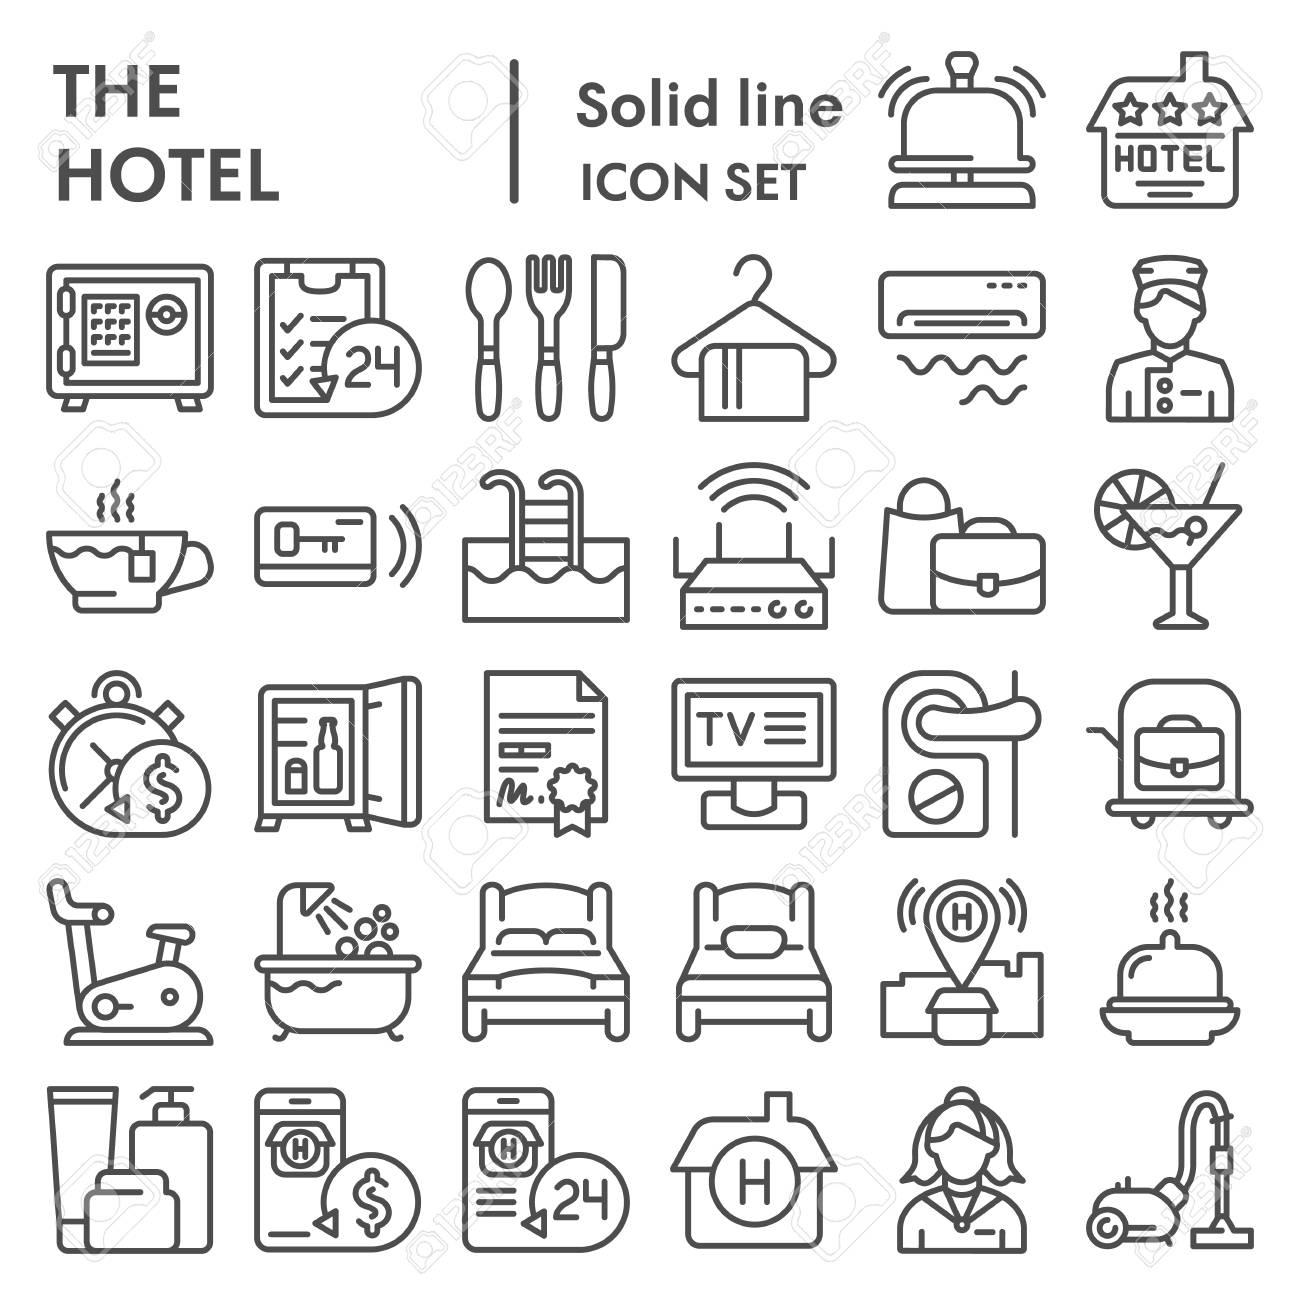 Hotel line icon set, service symbols collection, vector sketches,